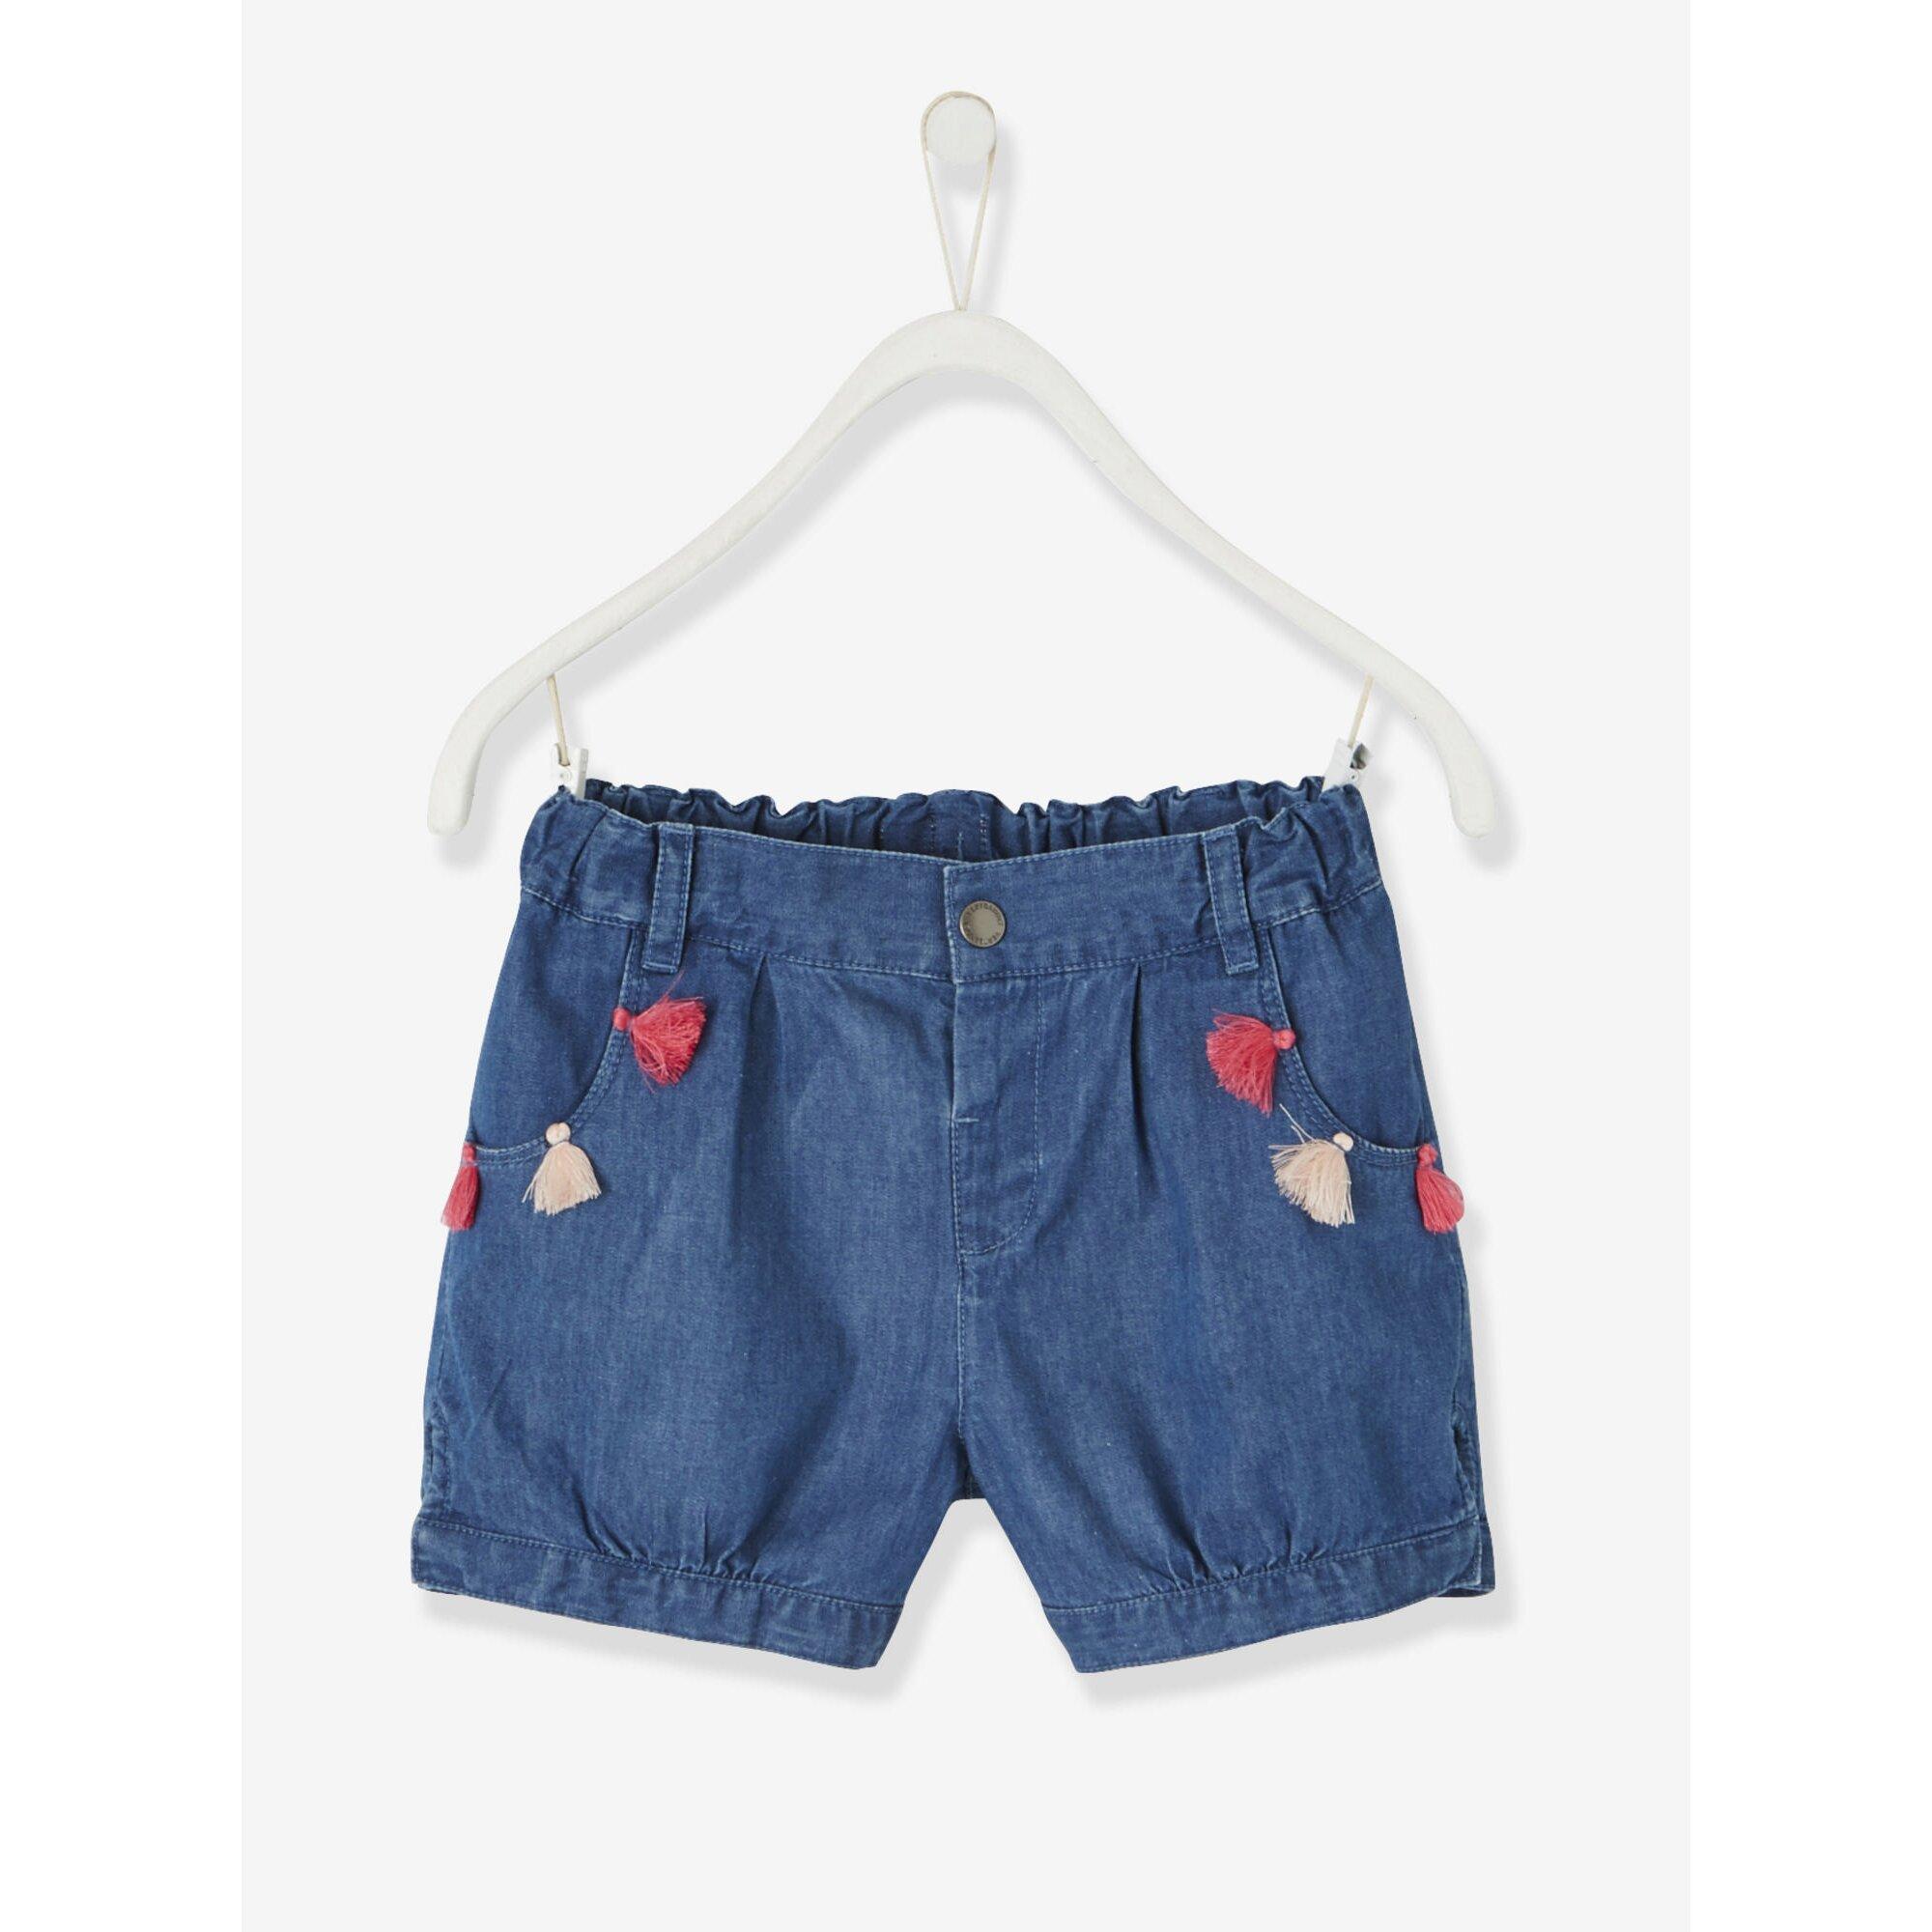 vertbaudet-jeans-shorts-fur-madchen-ethno-look